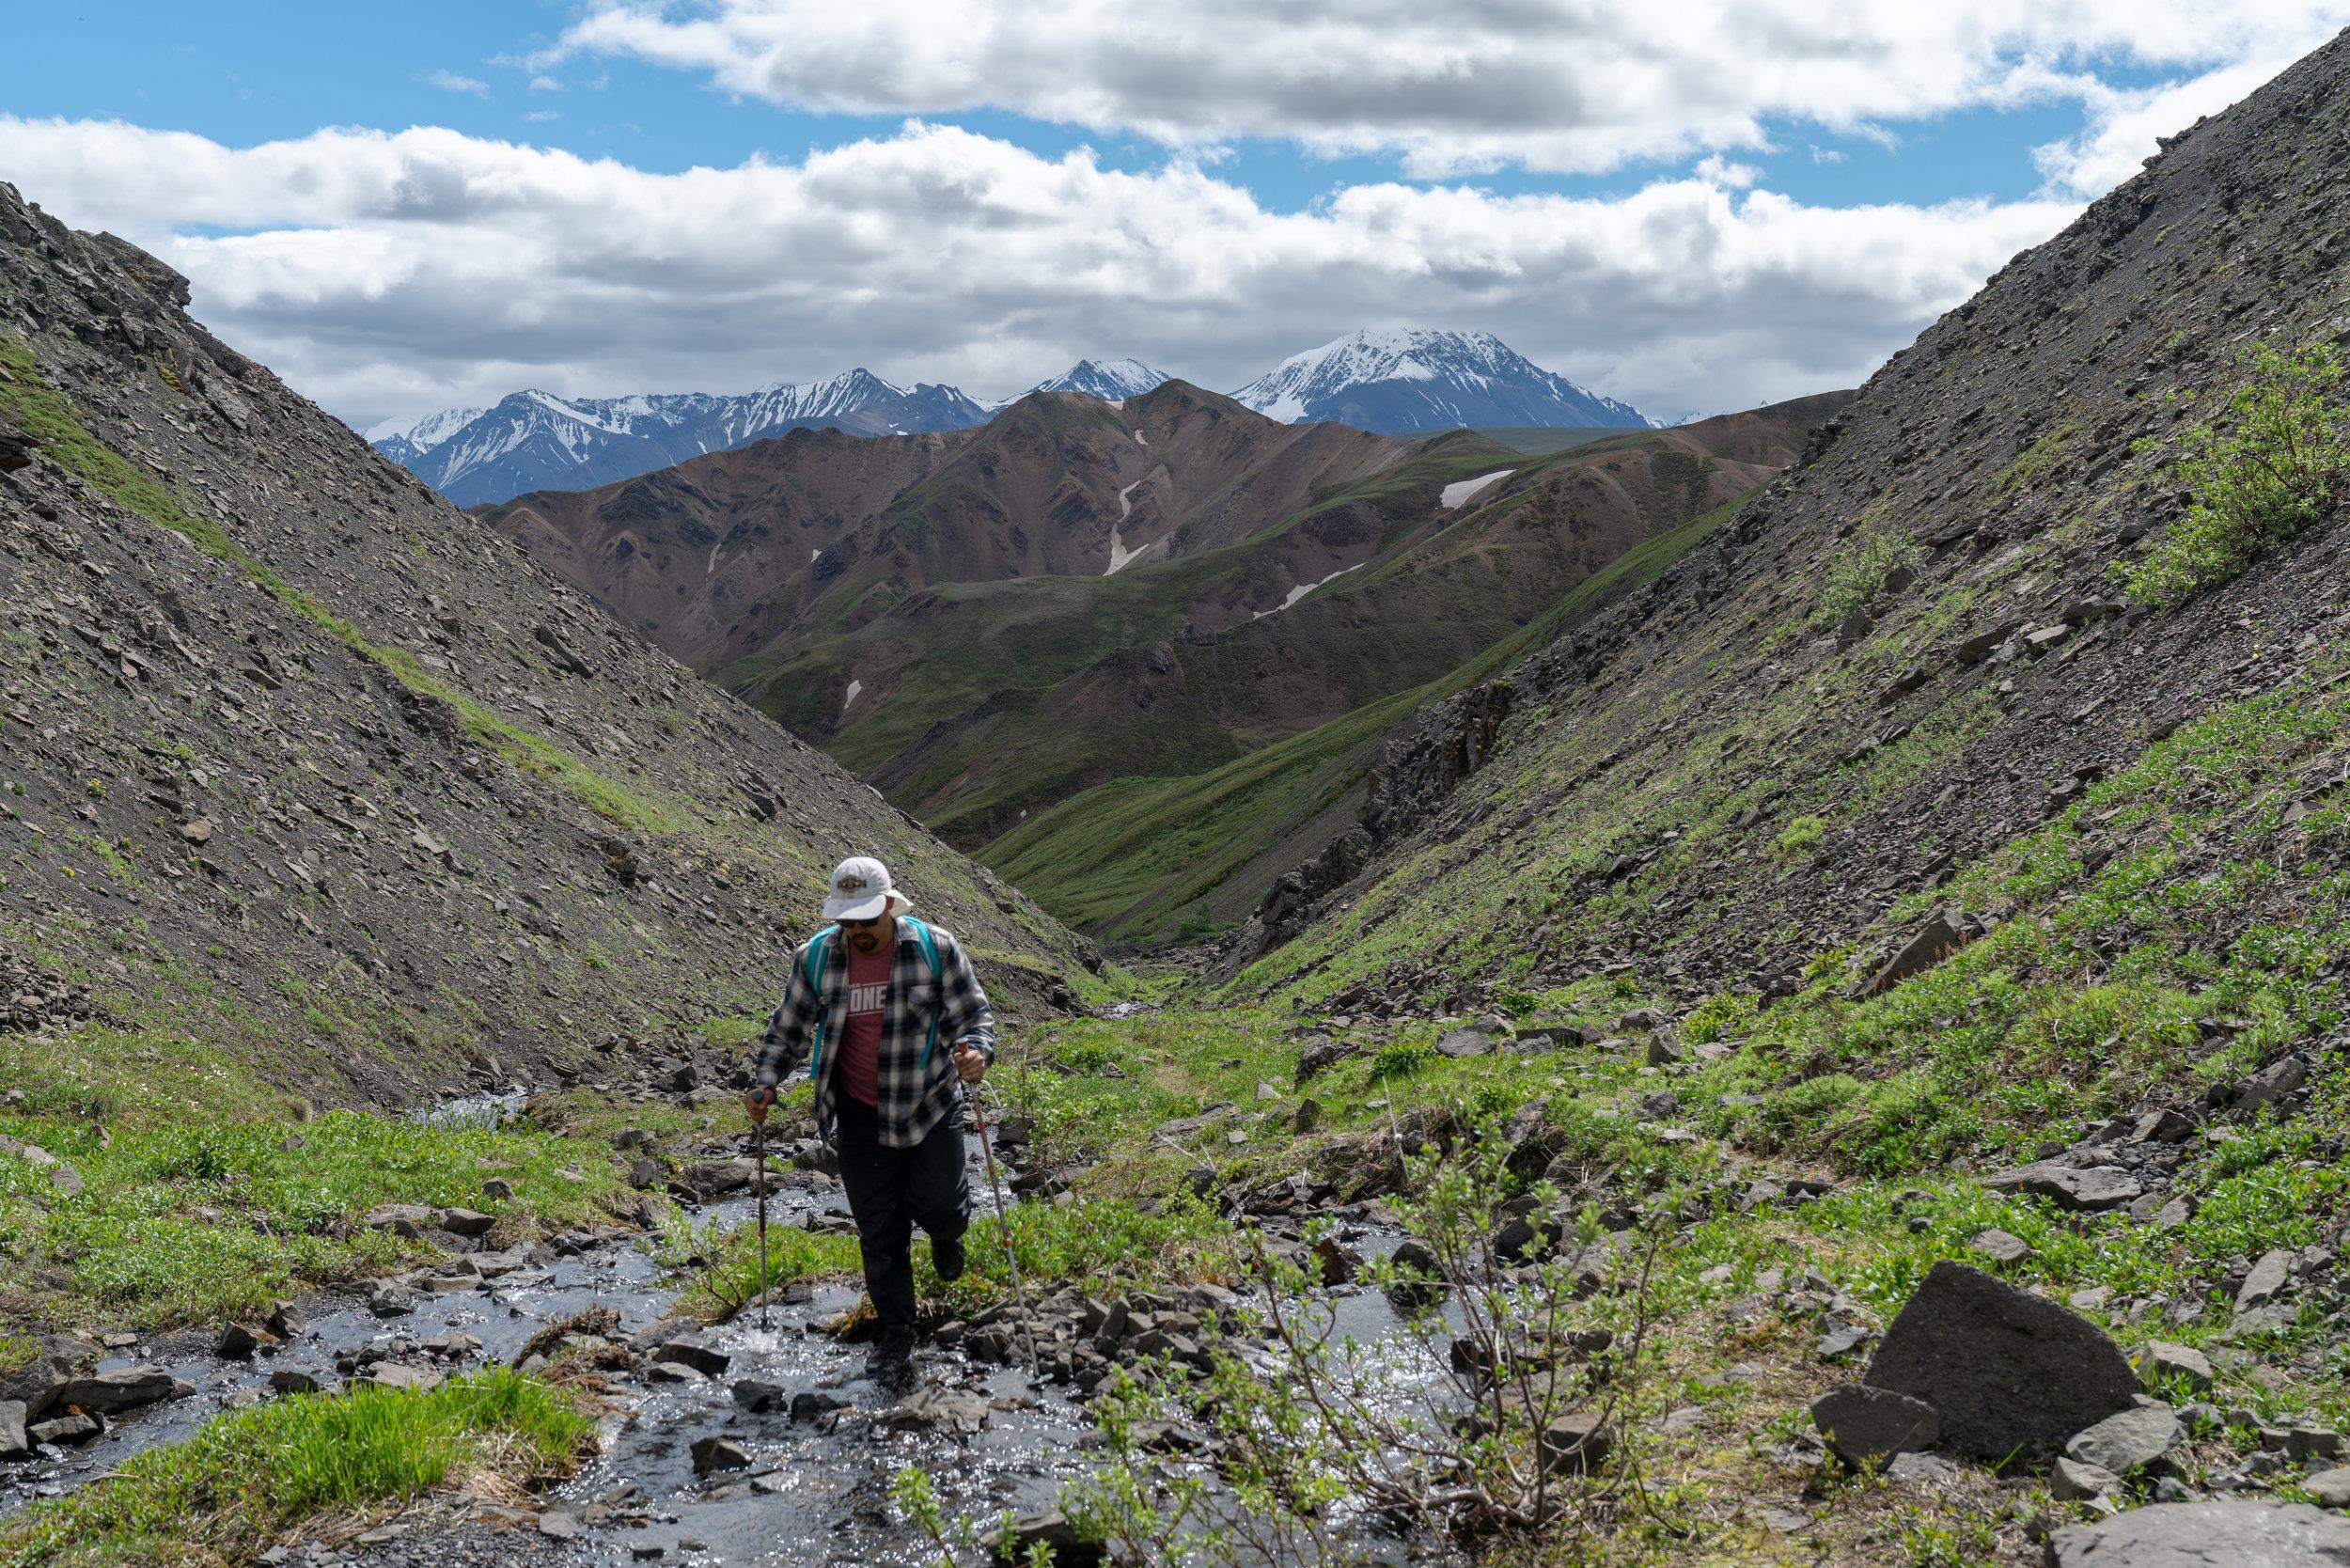 Composer David Wanner makes his way up Tattler Creek in Denali National Park (2018)